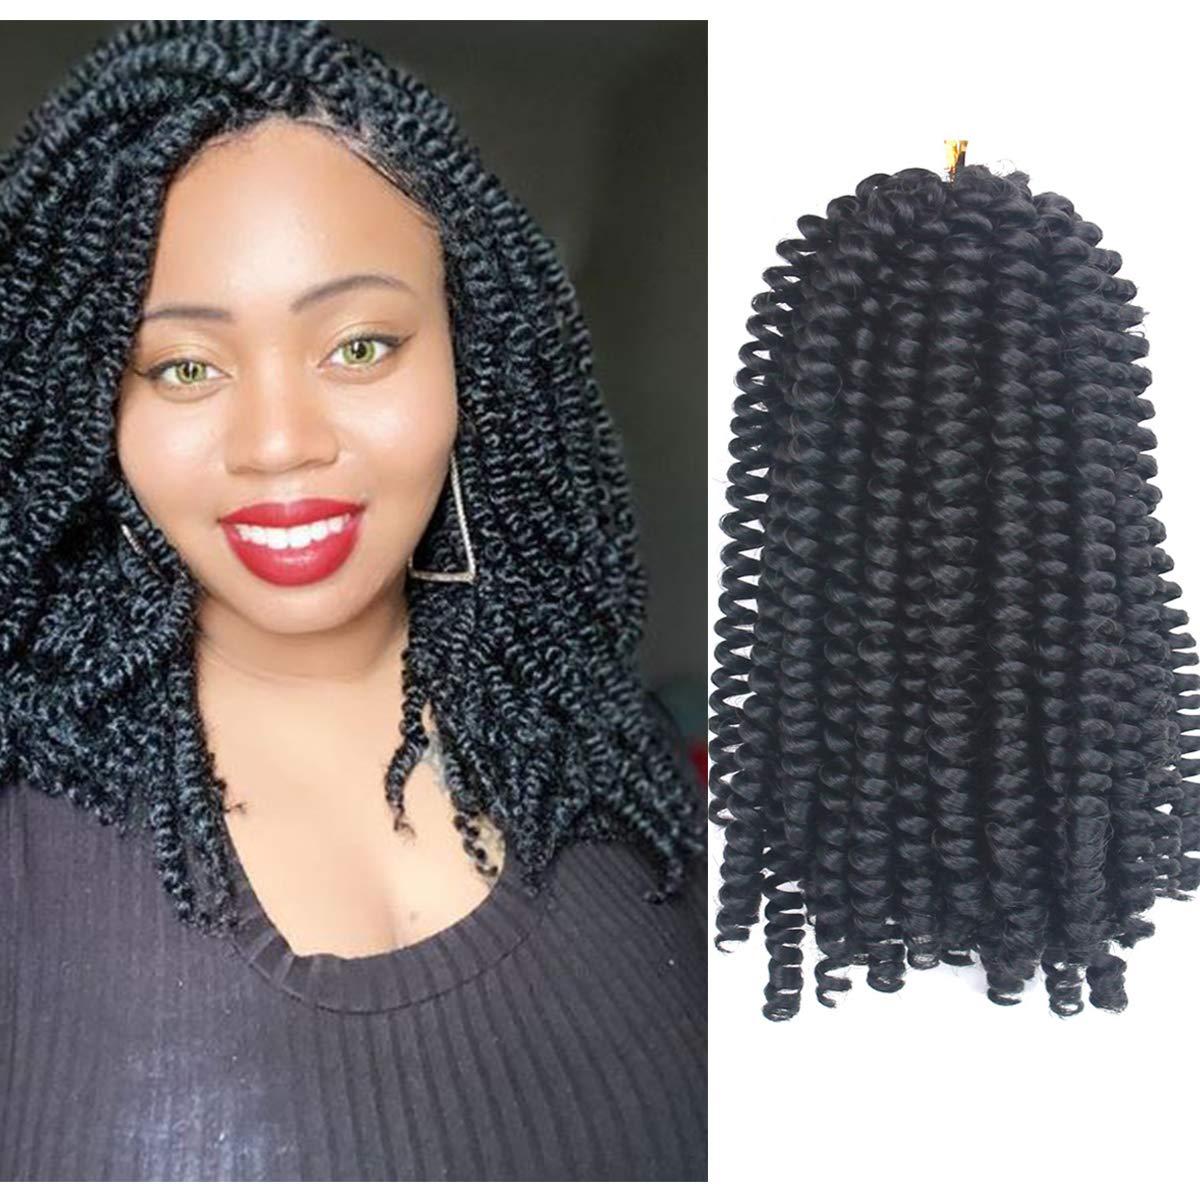 8 Inch Spring Twist Crochet Braiding Hair Extensions Natural Black Color 4 Packs Synthetic Short Bomb Twist Mini Passion Twist Fluffy Spring Twist Crochet Braids Hair(30Strands/Pack,2#)